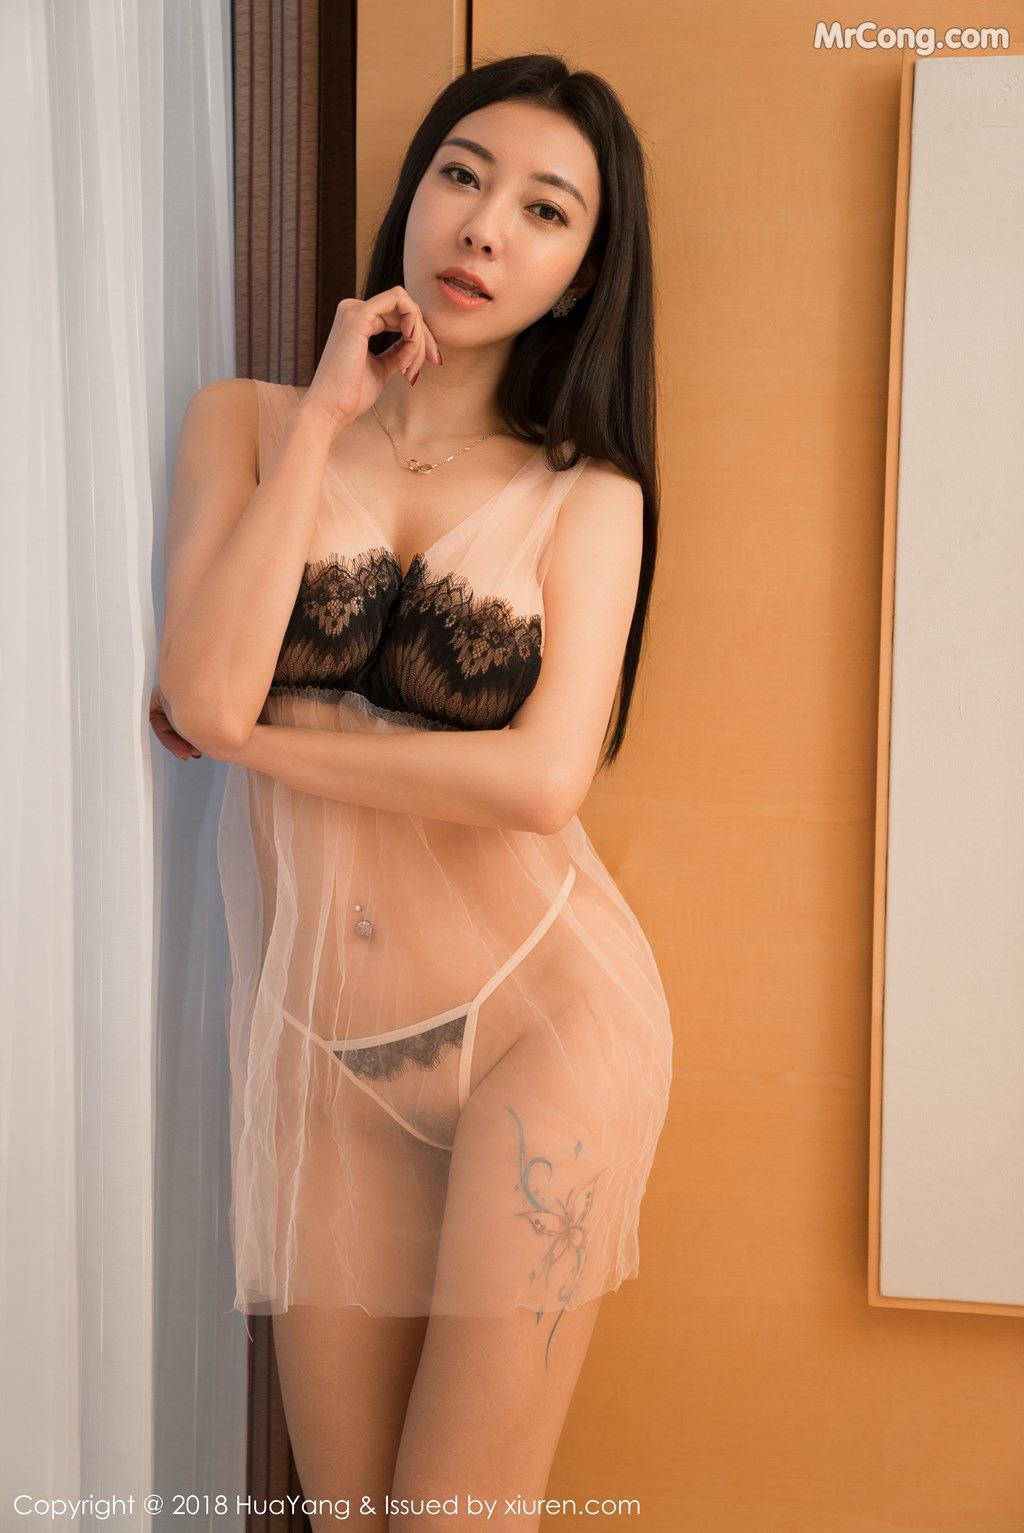 Image HuaYang-2018-01-26-Vol.028-Victoria-Guo-Er-MrCong.com-008 in post HuaYang 2018-01-26 Vol.028: Người mẫu Victoria (果儿) (41 ảnh)